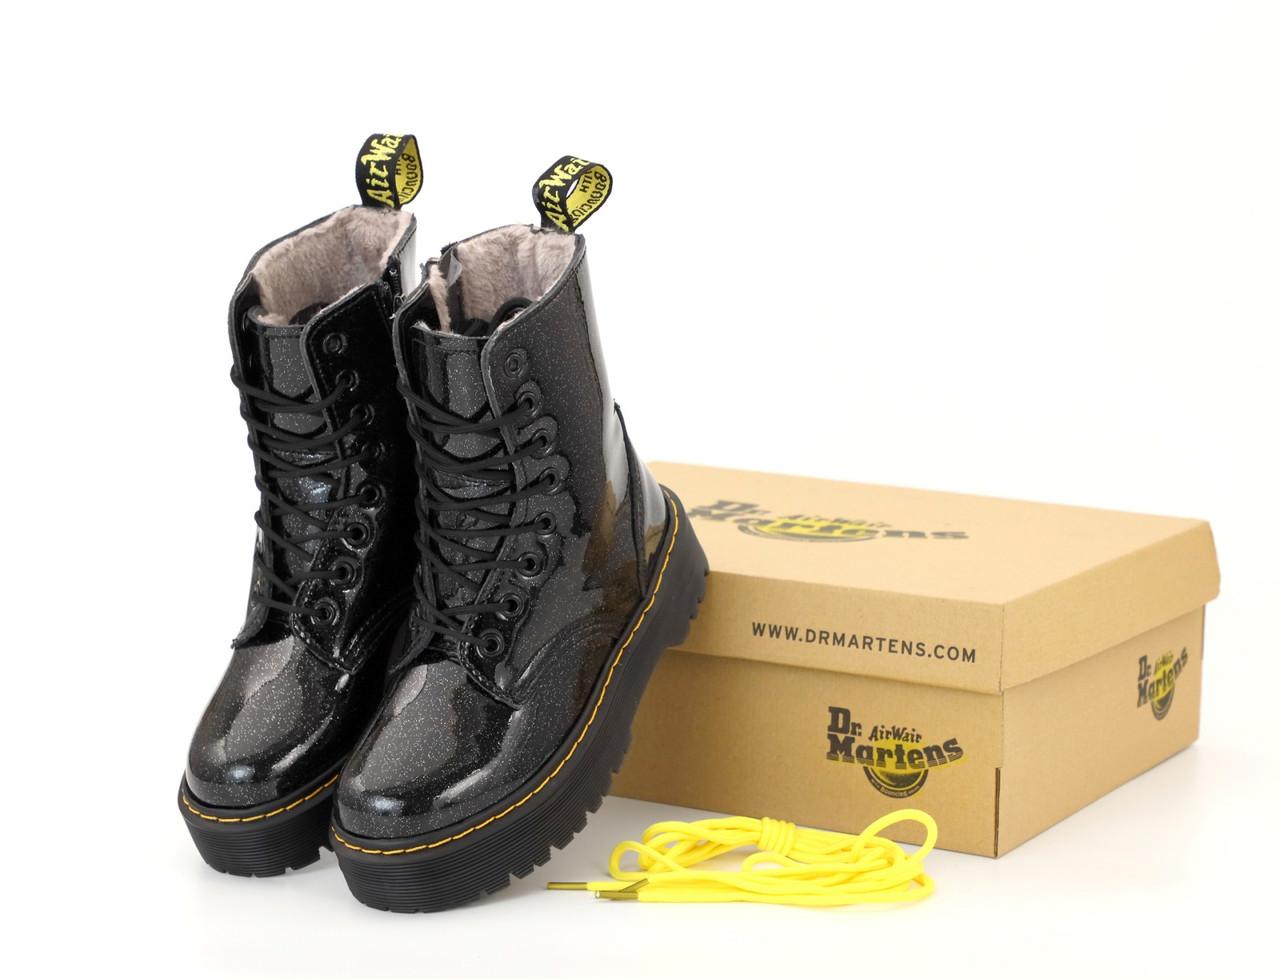 Женские ботинки Dr.Martens  JADON Galaxy кожа, ЗИМА. ТОП Реплика ААА класса.